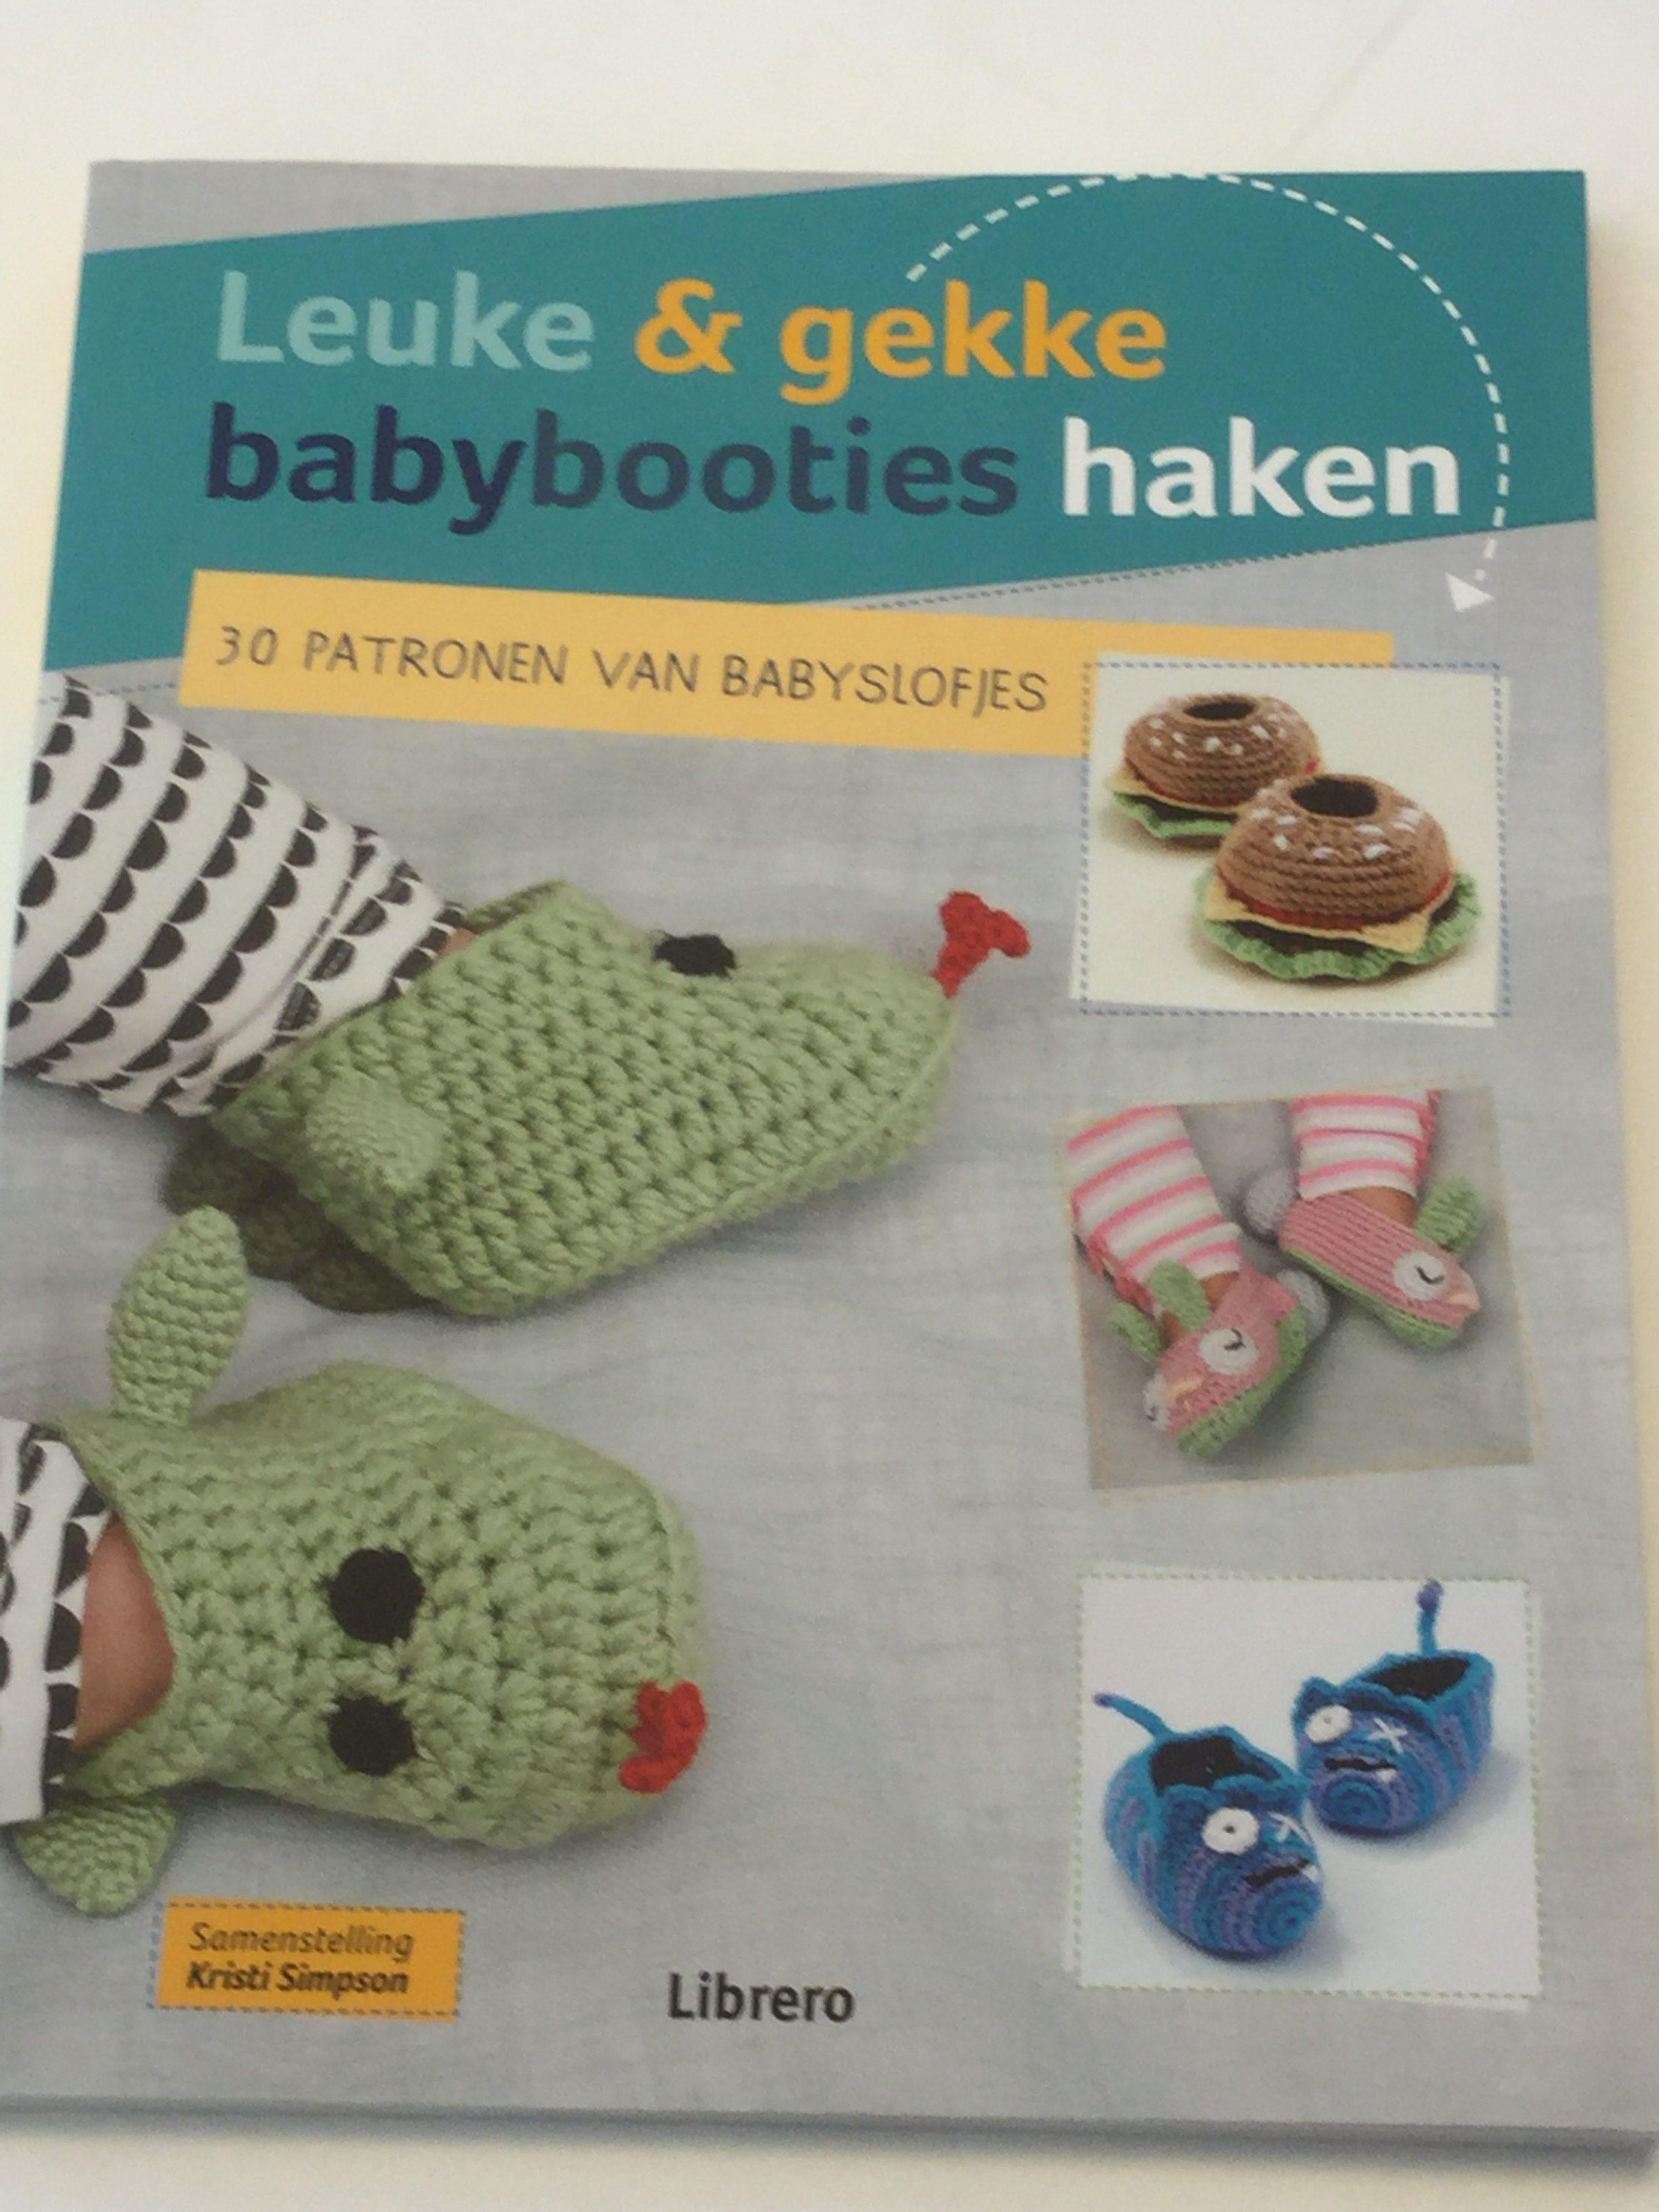 Leuke Gekke Babybooties Haken Kristi Simpson Bij Atelier 9a